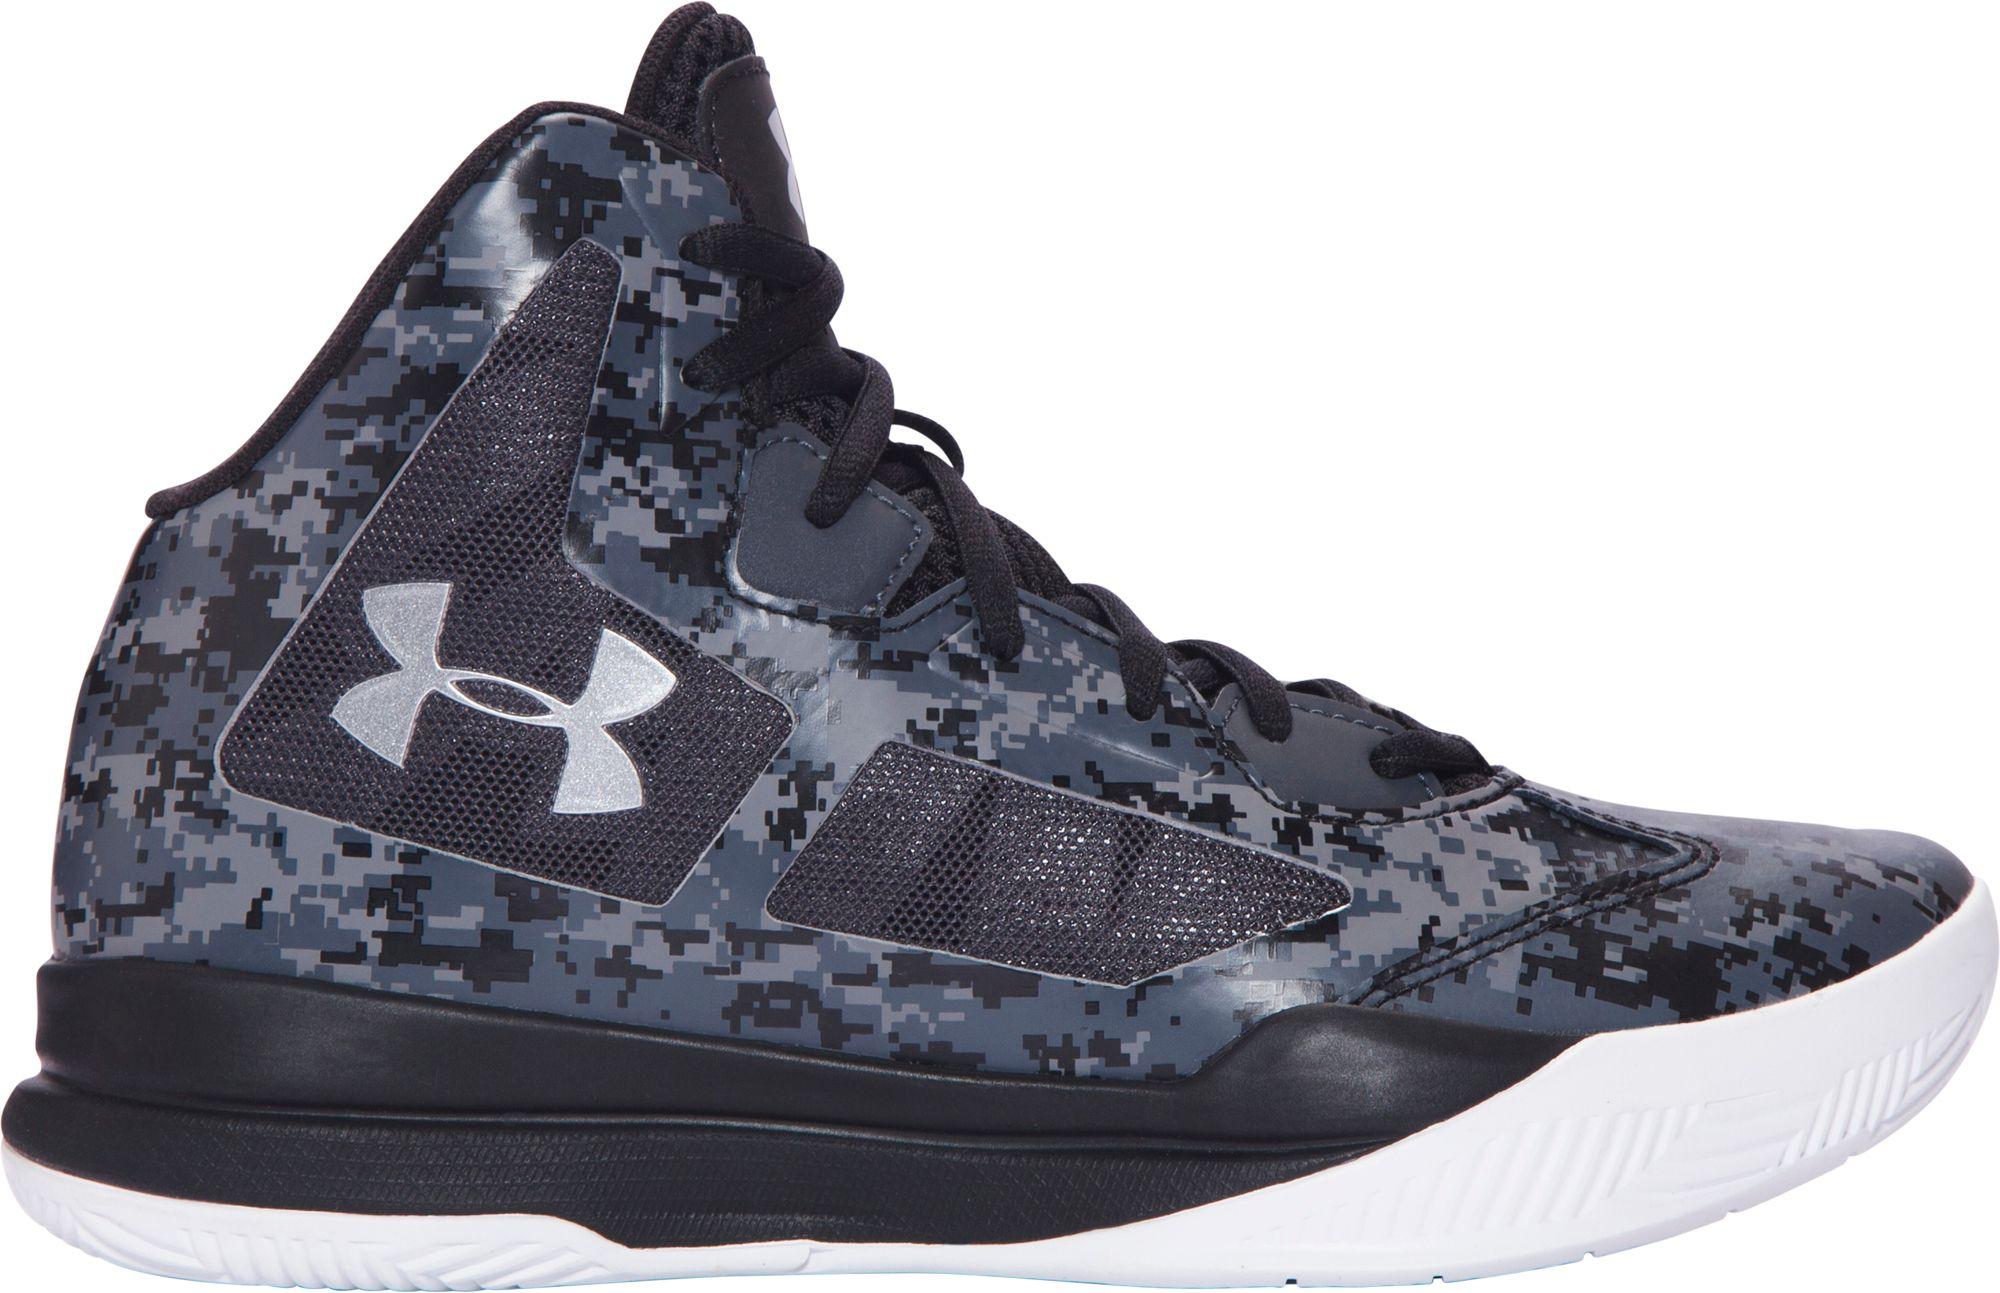 basketball sneakers noimagefound ??? ZHOSPJL